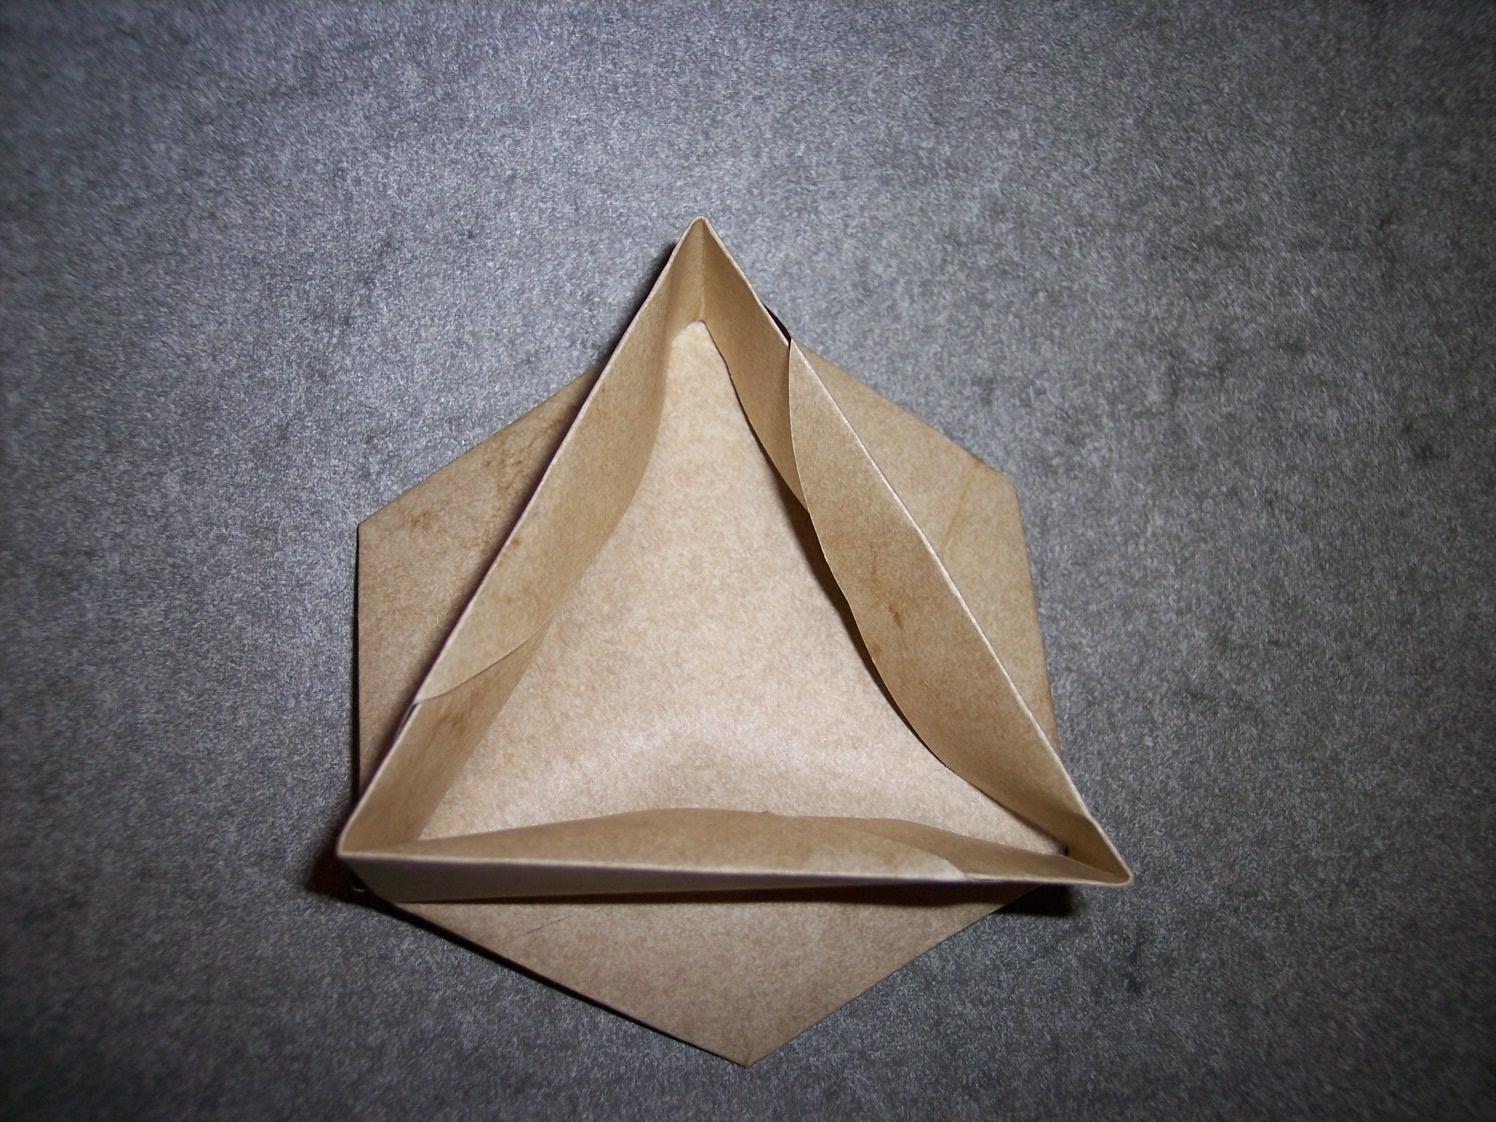 hight resolution of hexangle help1 hexangle help2 hexangle help3 000 4488 jpg